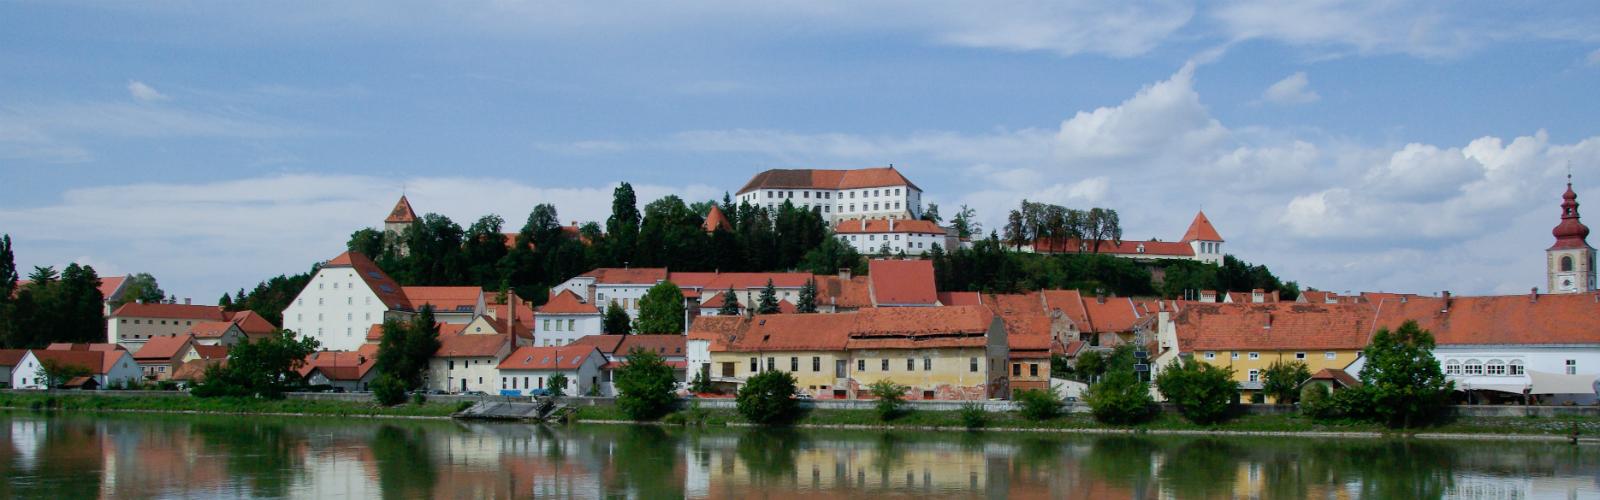 Last minute naar Slovenië? Grijp je kans!